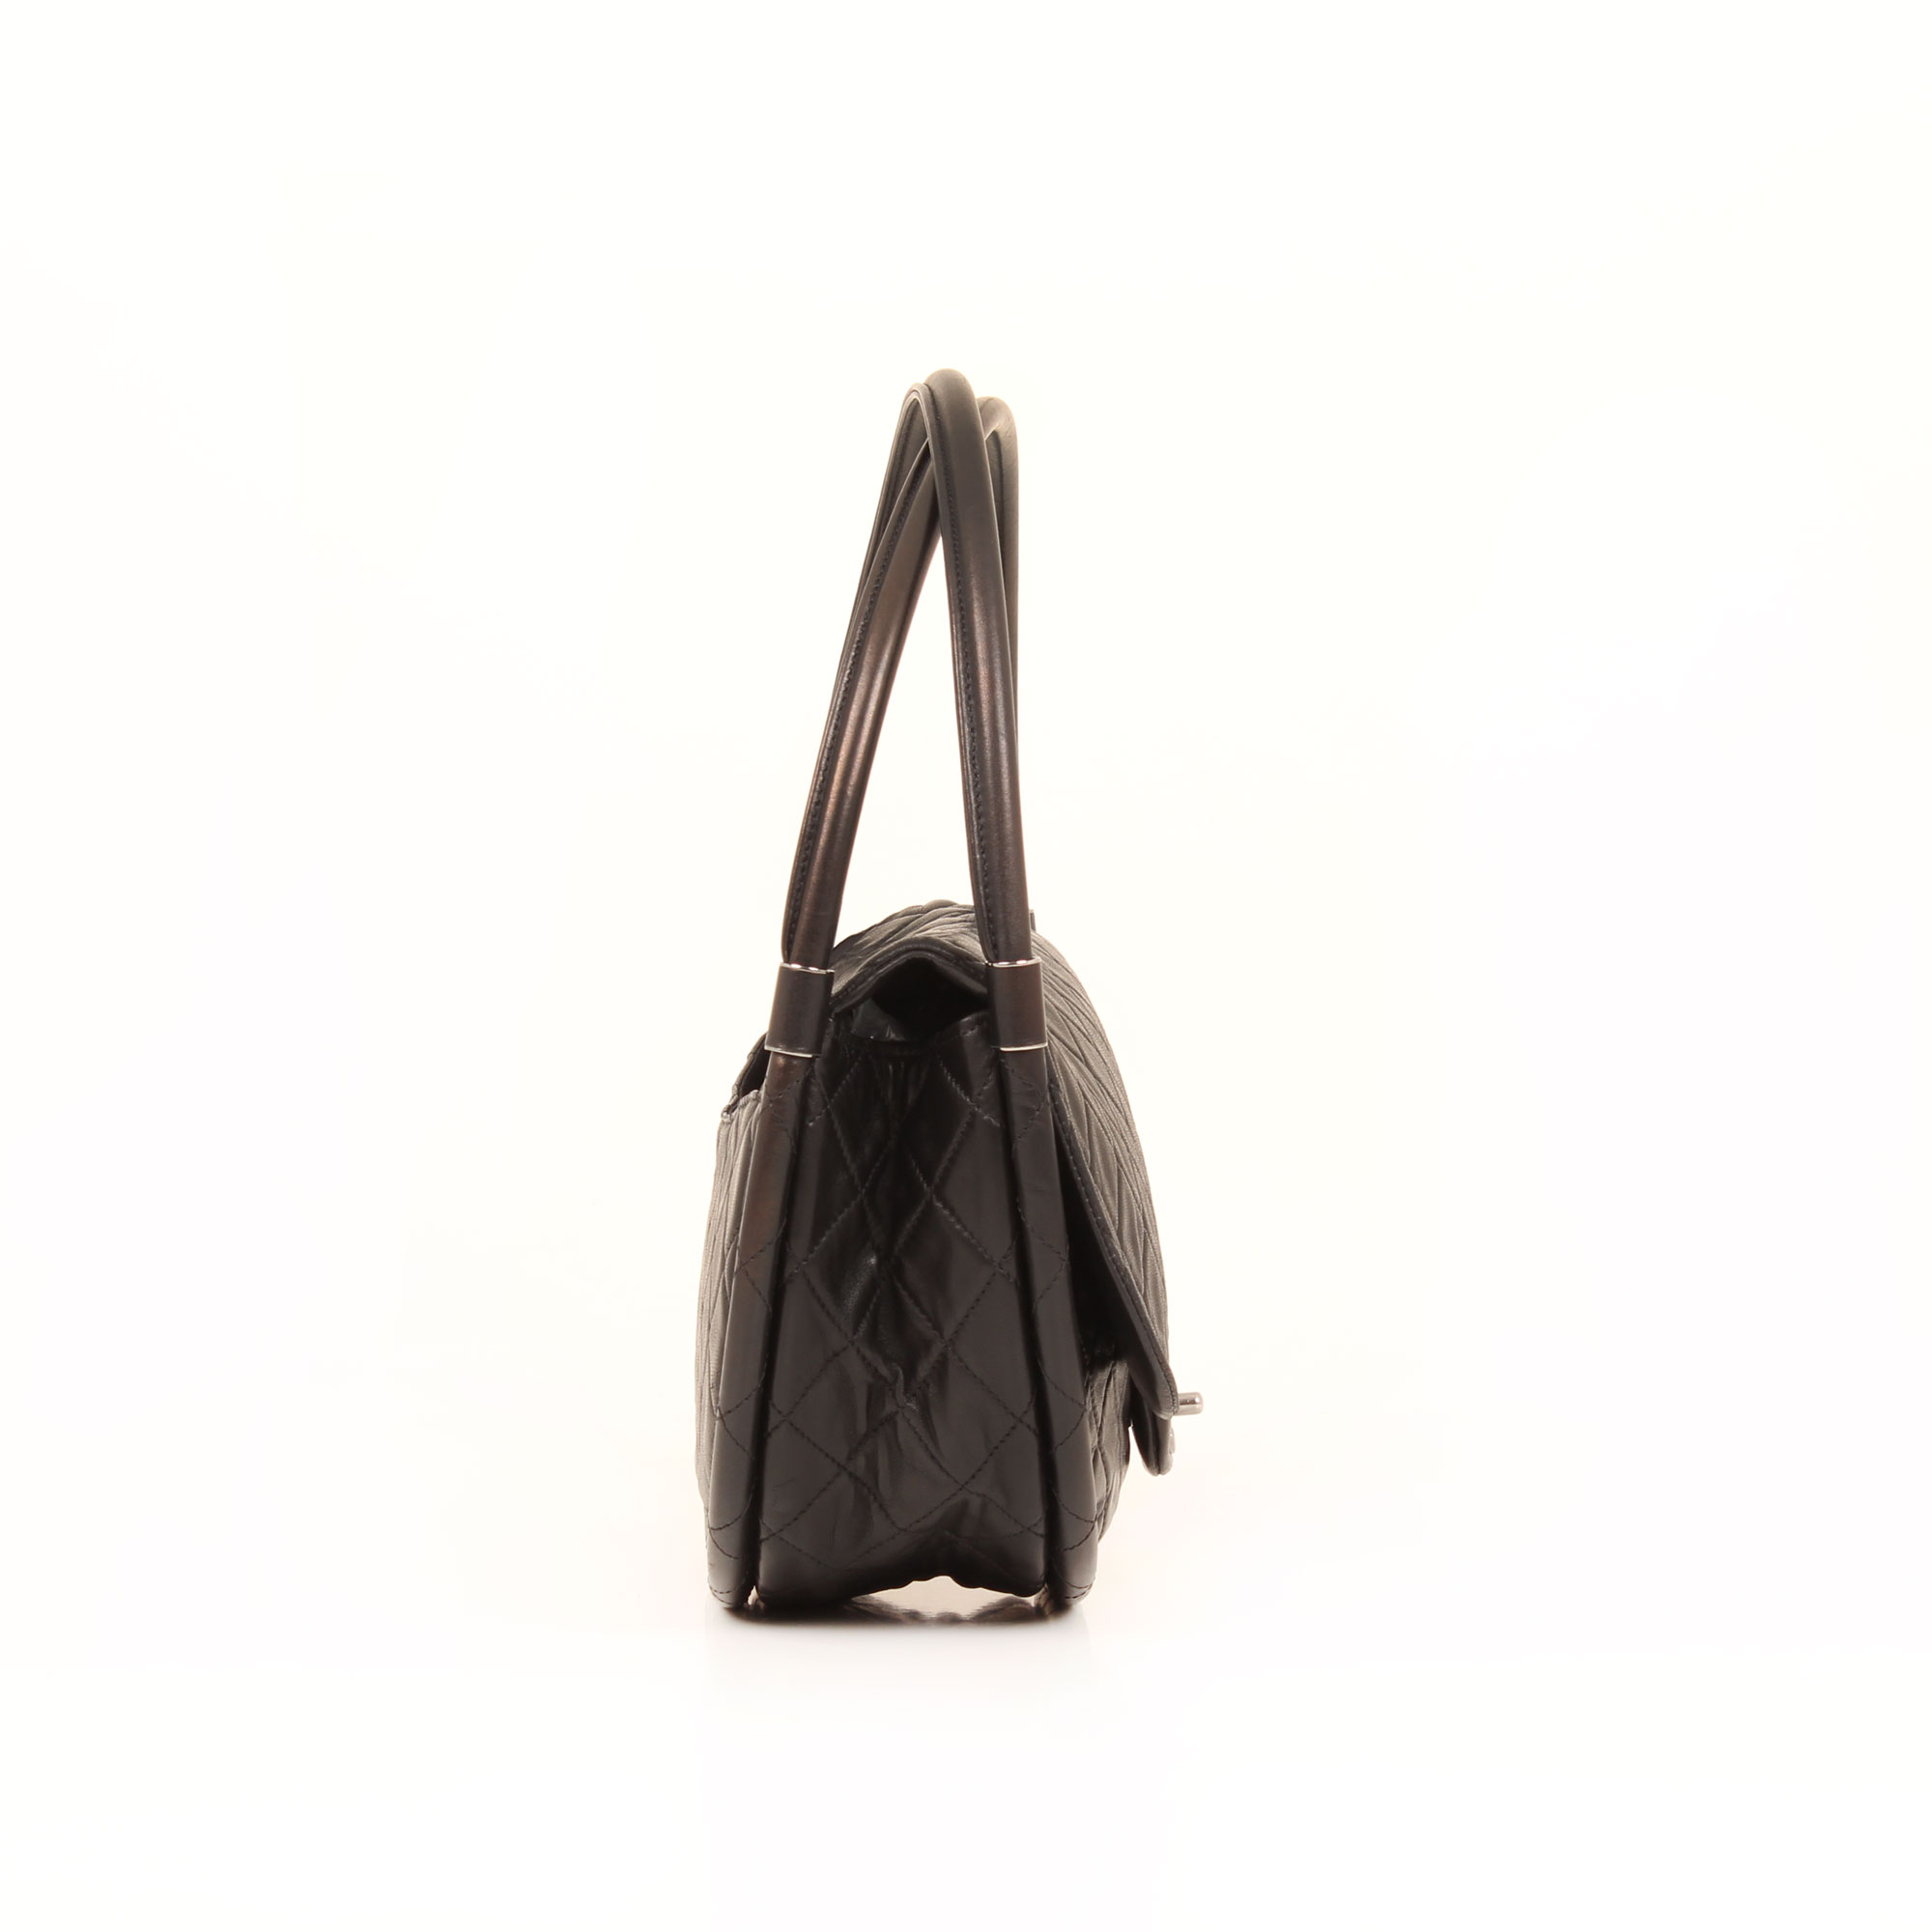 bag-chanel-hula-hoop-black-side